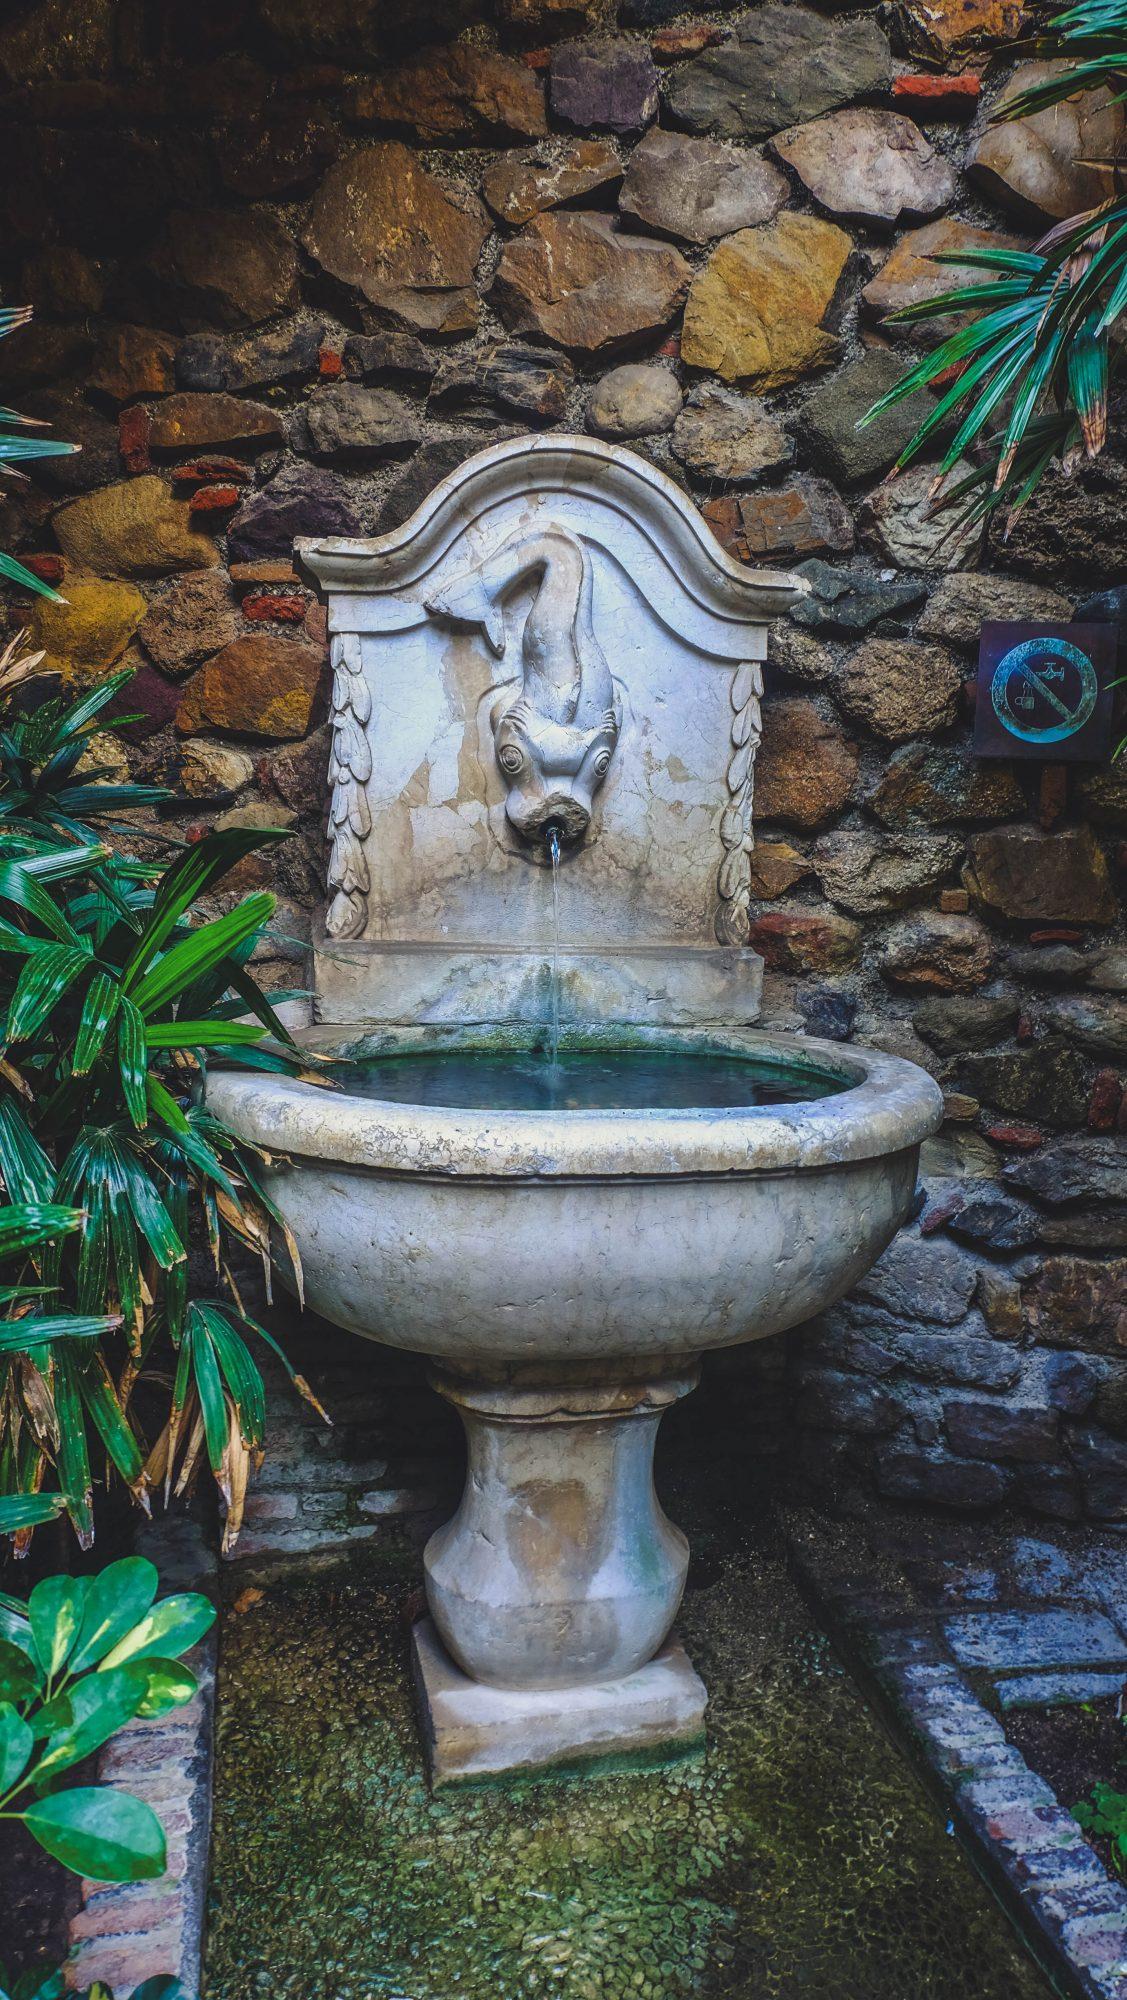 Fontaine poisson - Malaga, Espagne